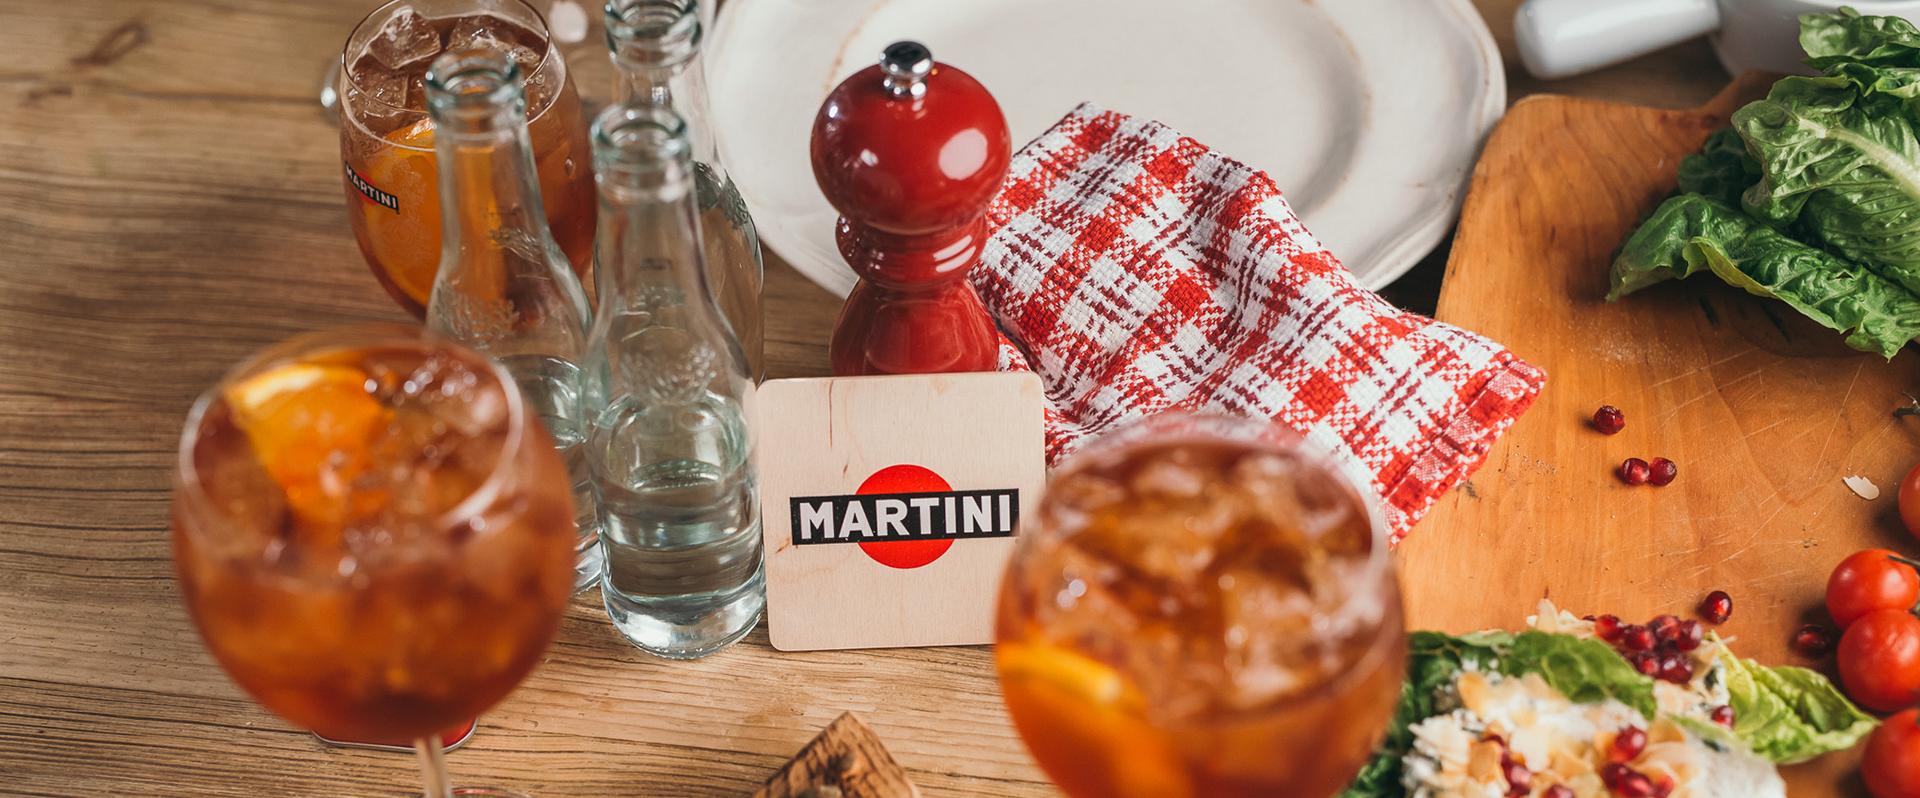 Martini x Aioli